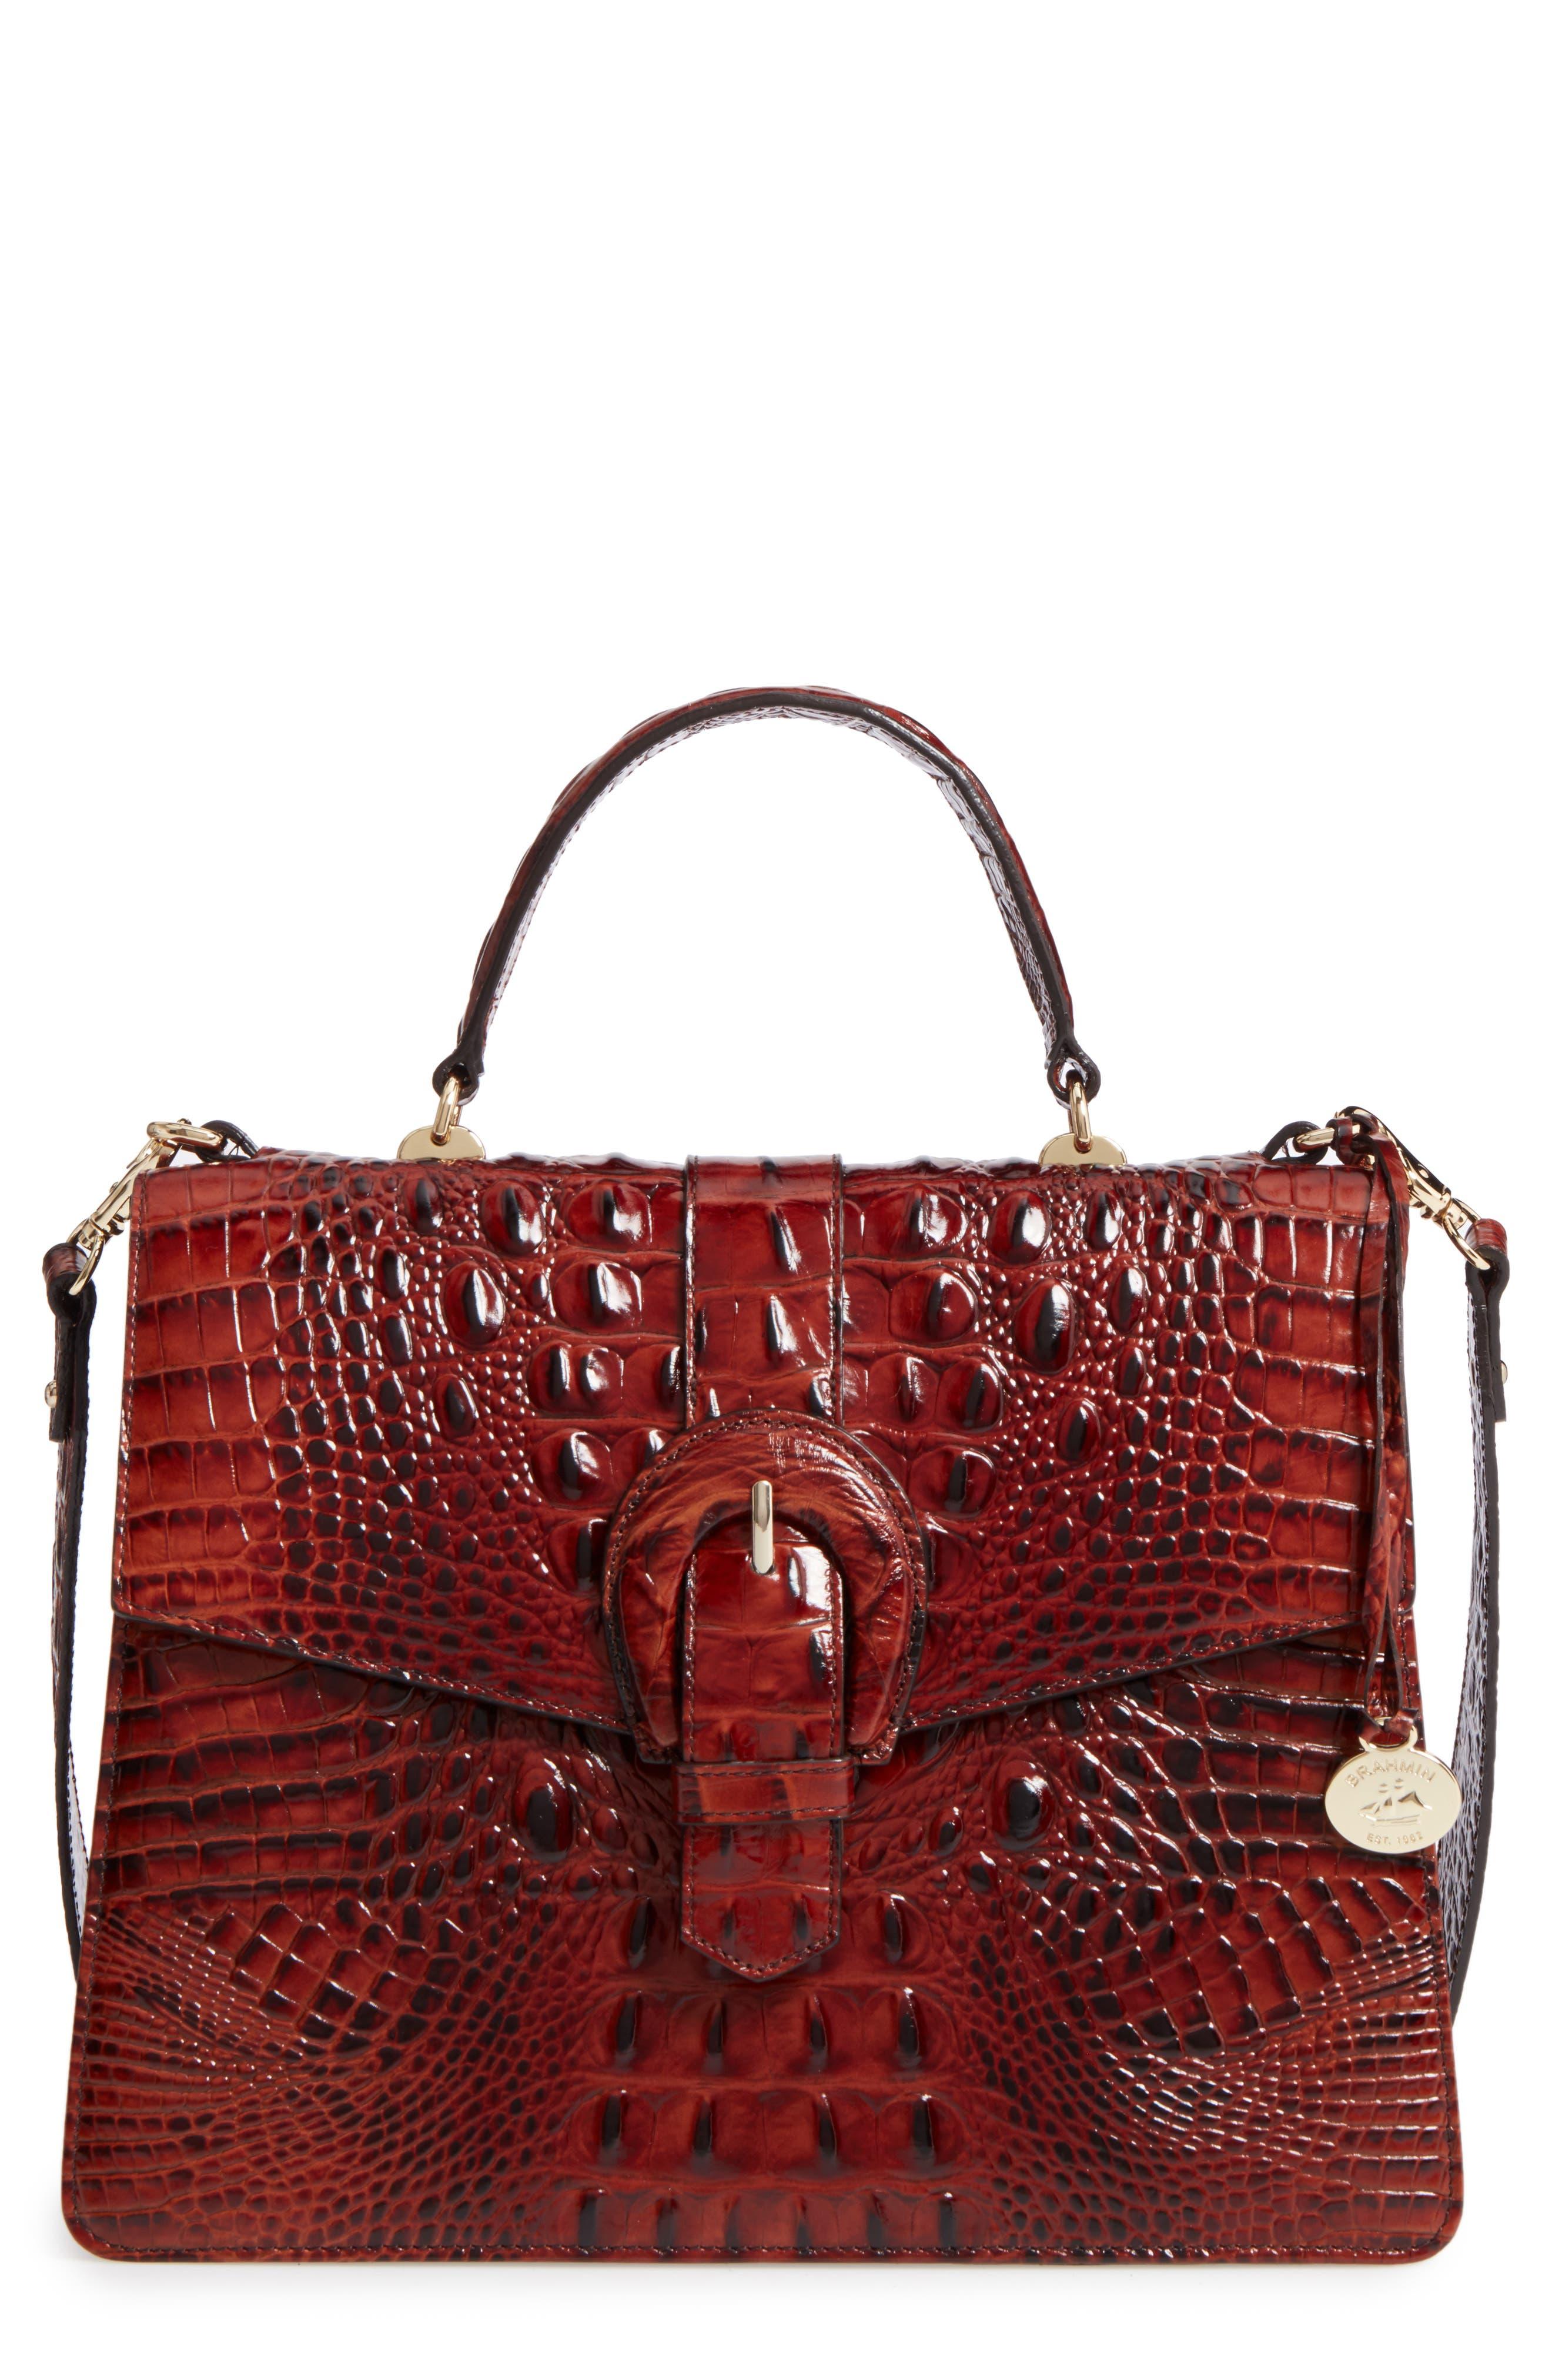 Alternate Image 1 Selected - Brahmin Melbourne Gabriella Embossed Leather Satchel